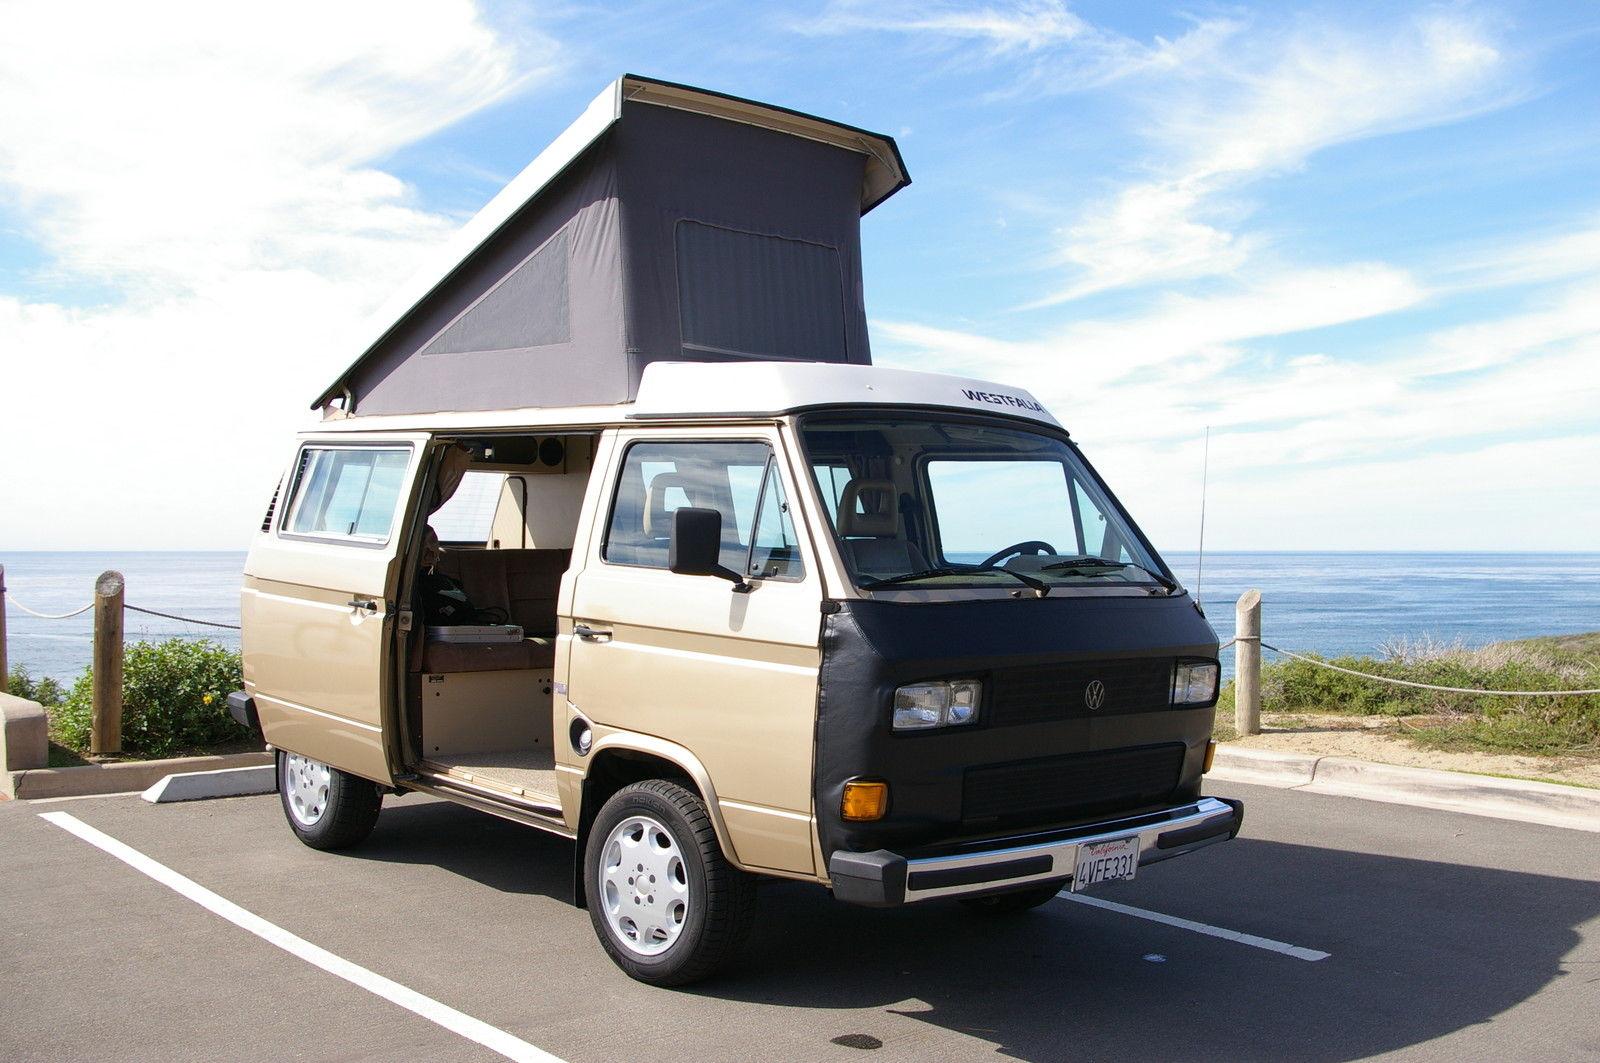 1986 VW Westfalia Camper w/ new Subaru 2.2L & new transmission - San Diego, CA - Auction Ends February 7th 8pm PST